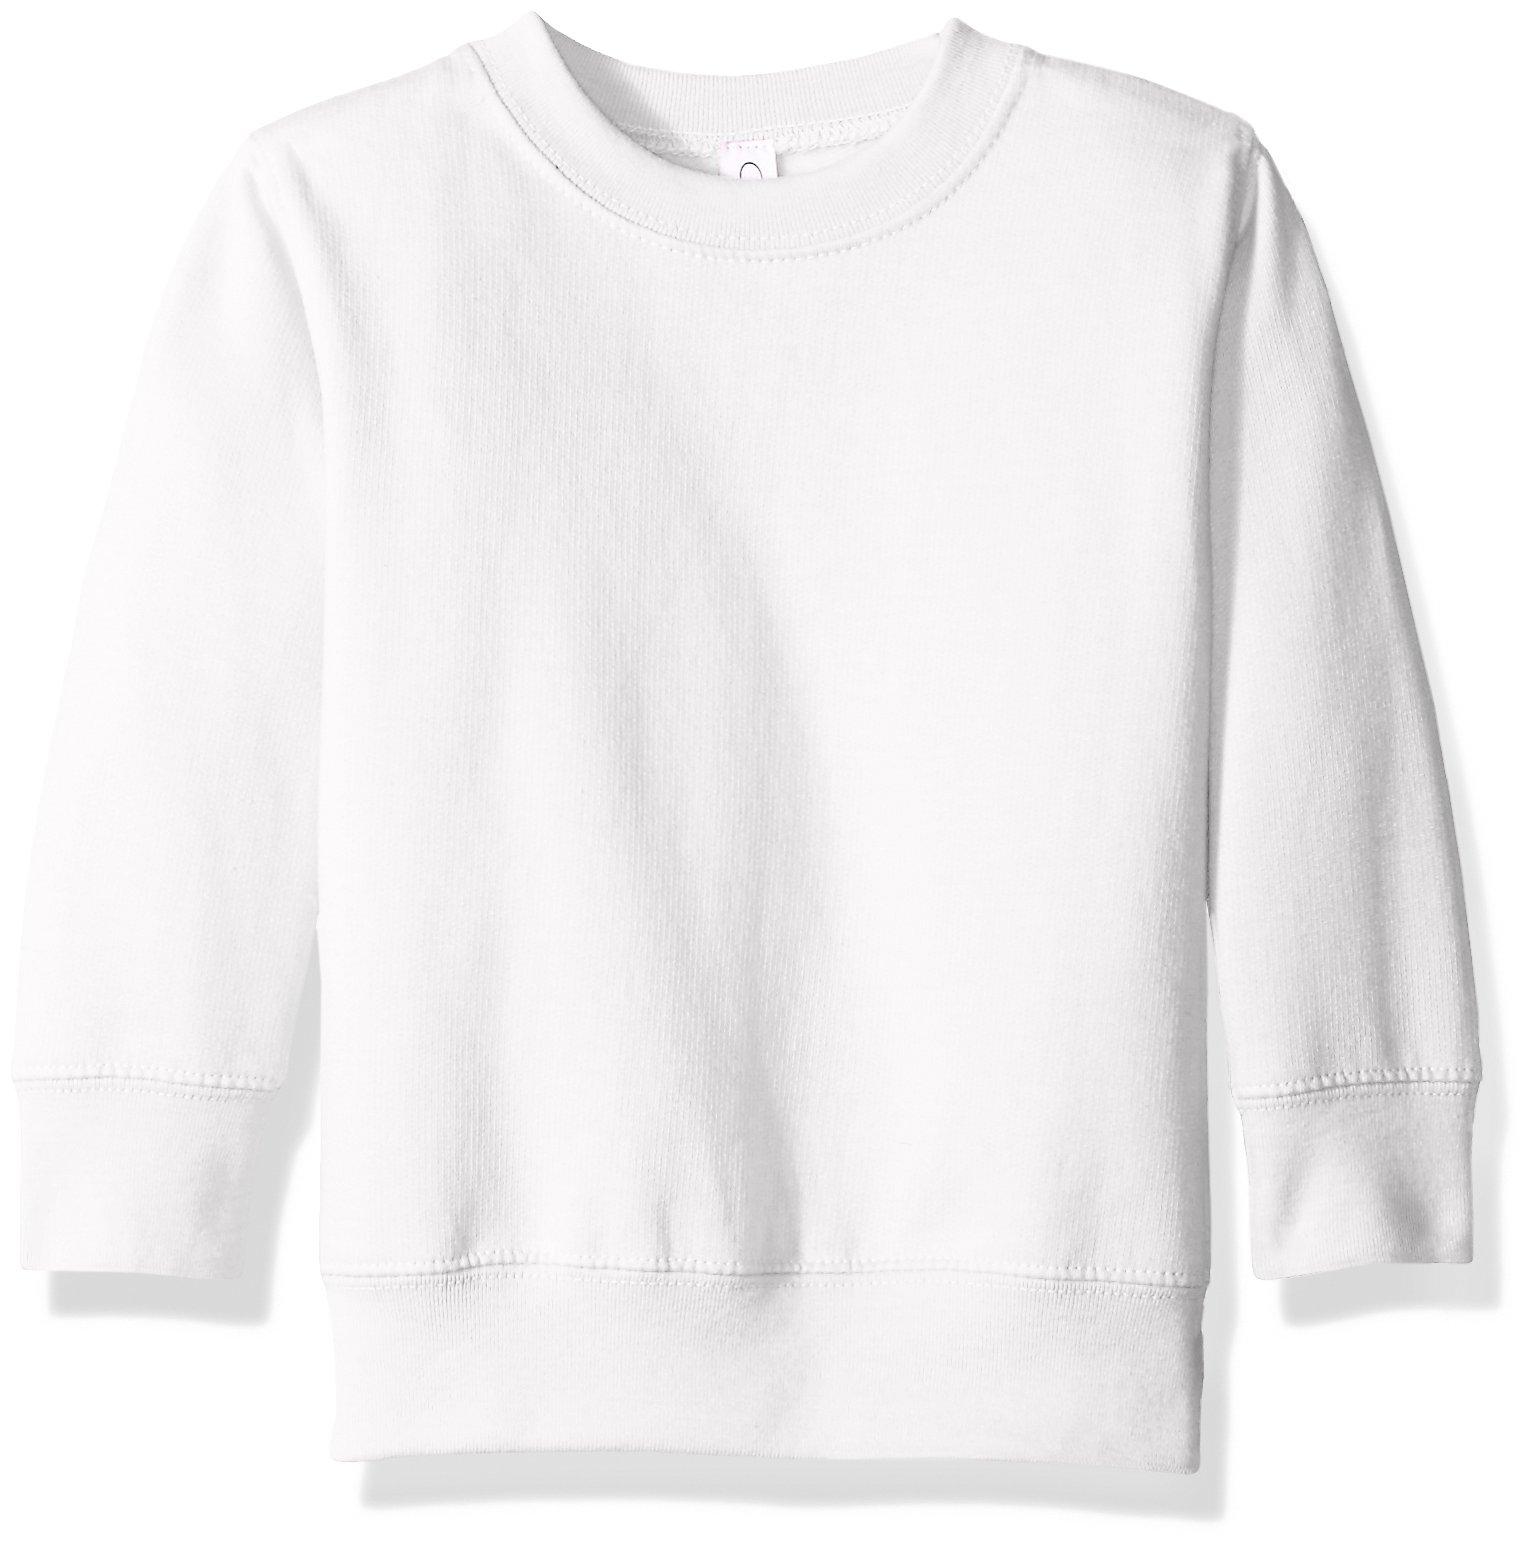 Clementine Apparel Girls' Little (2-7) Apparel Toddler's Fleece Sweatshirt, White, 4T by Clementine Apparel